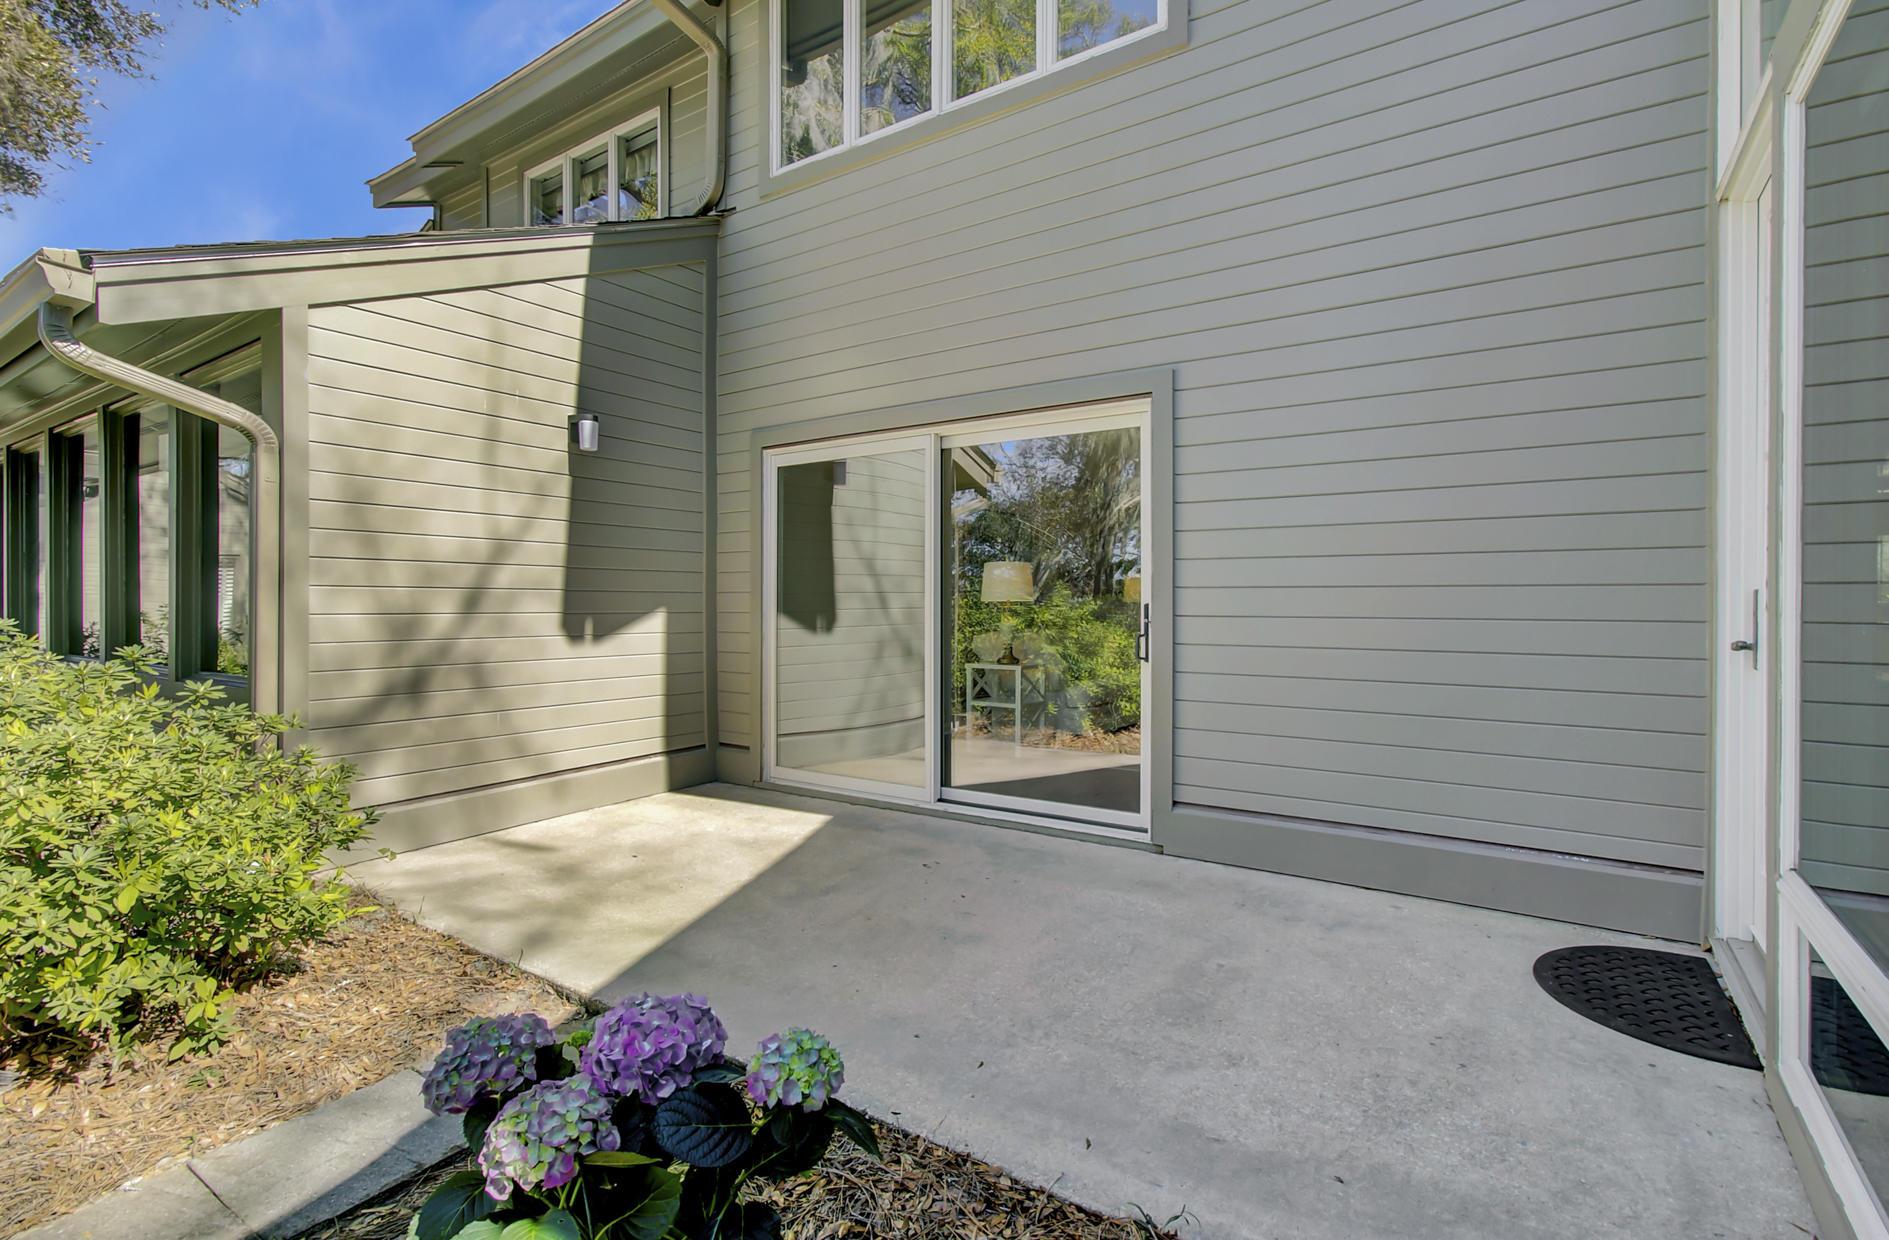 Wappoo Creek Place Homes For Sale - 29 Wappoo Creek, Charleston, SC - 30